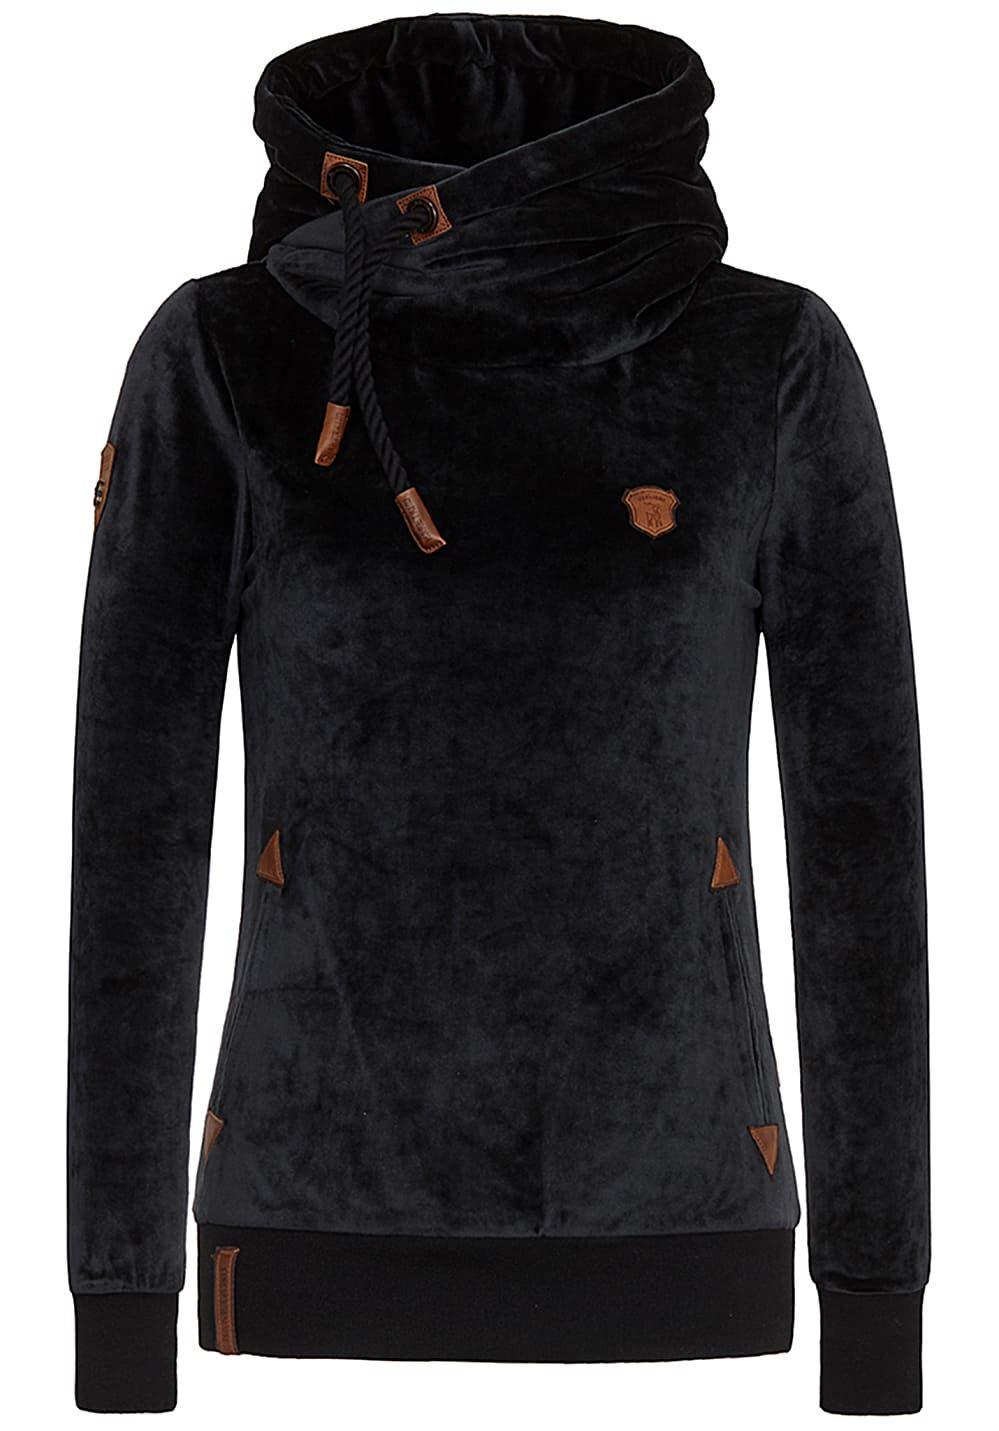 Pin by ladendirekt on Pullover | Sweatshirts, Pullover, Hoodies